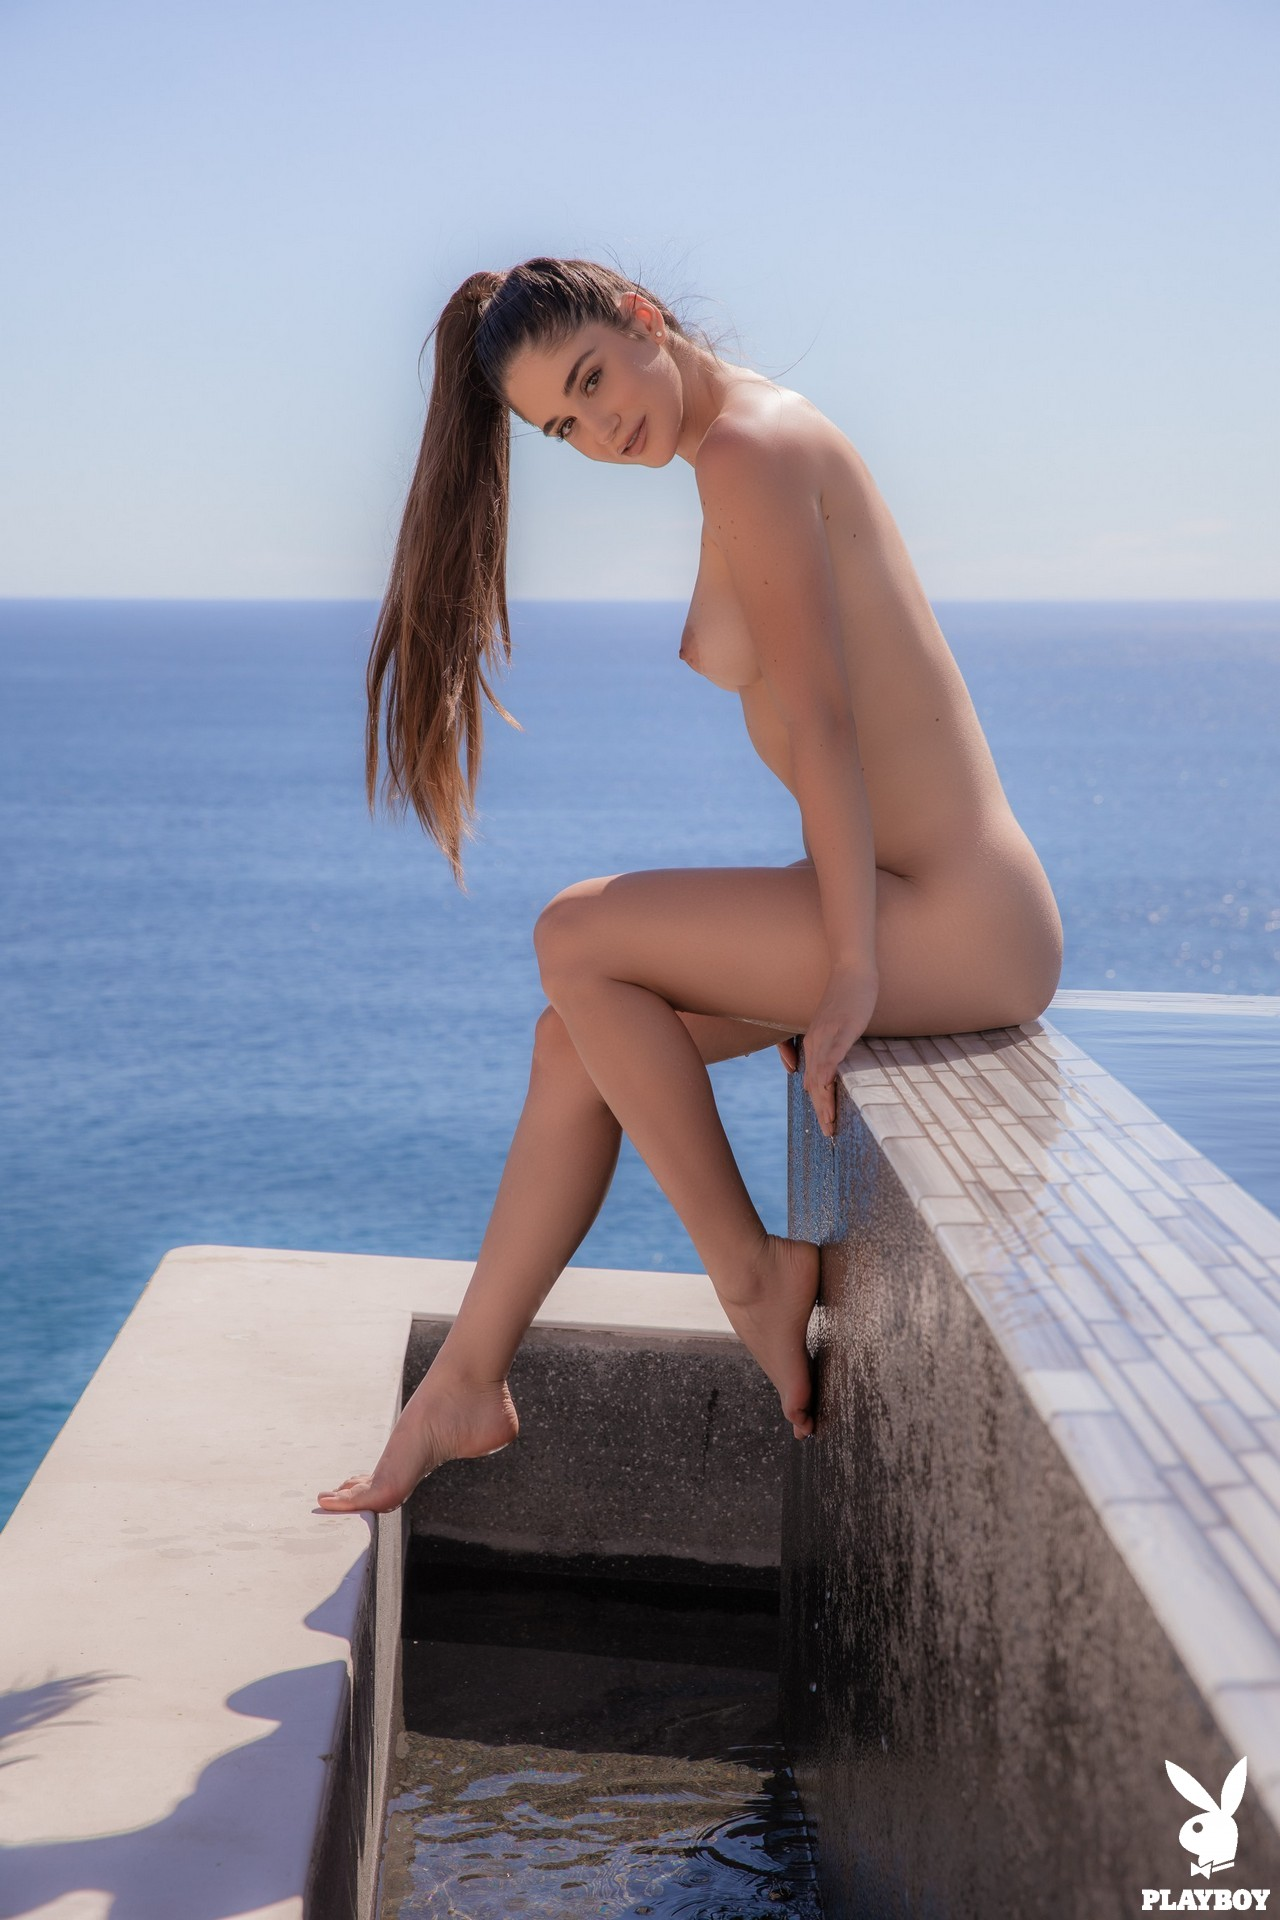 Rosé in Over the Horizon - Playboy Plus 21